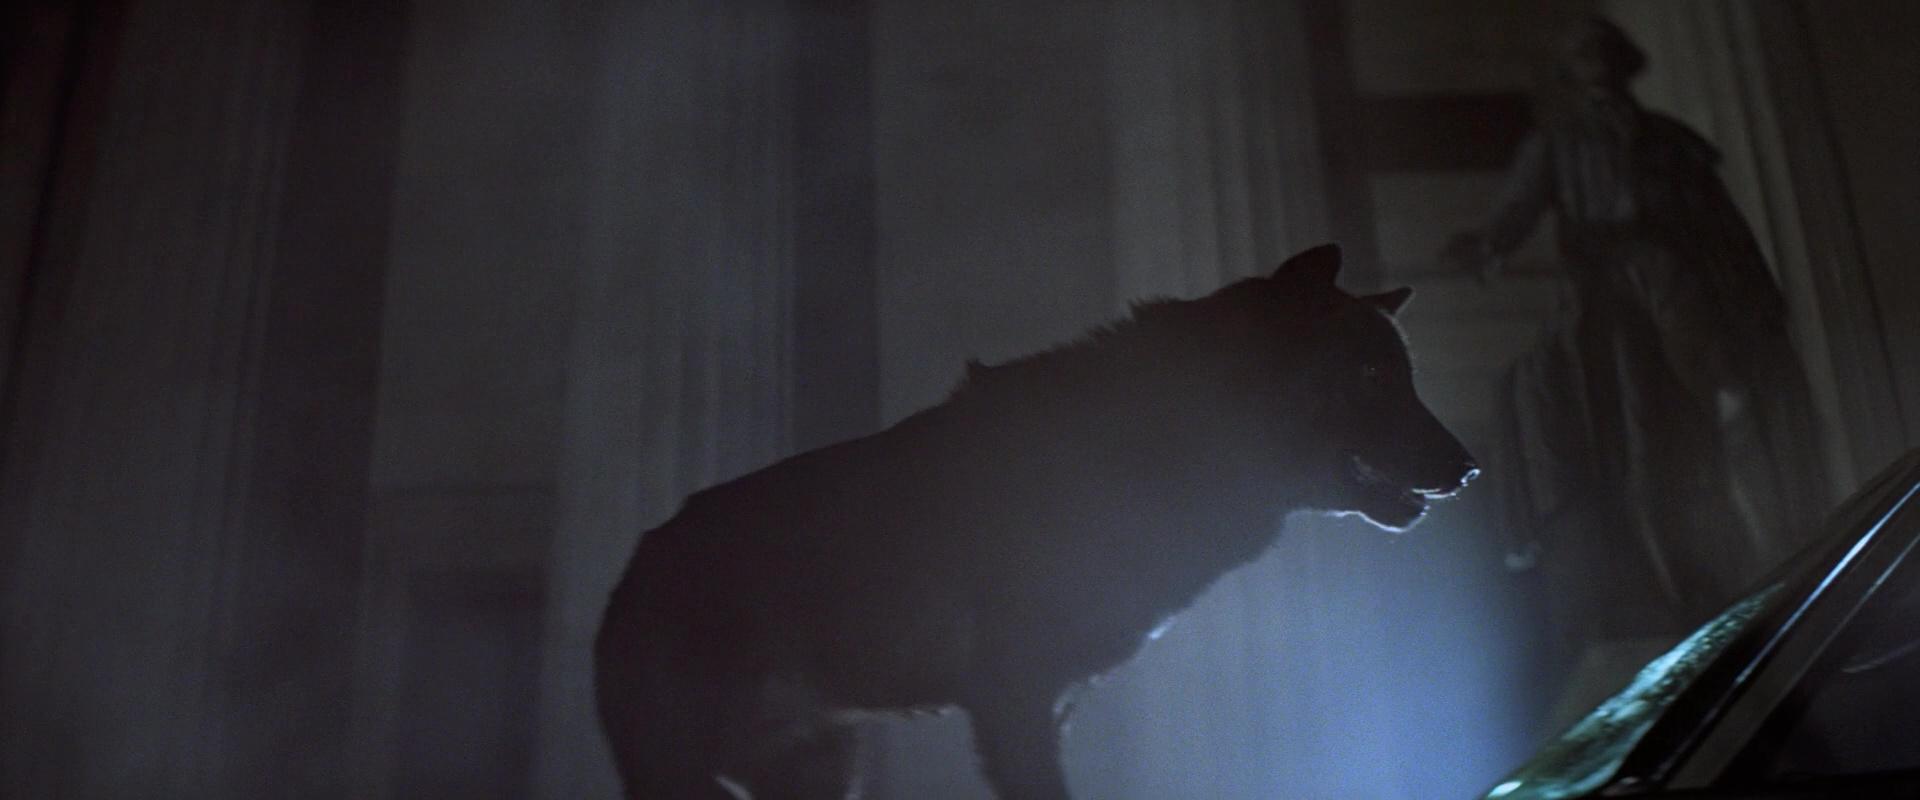 WOLFEN de Michael Wadleigh (1981)